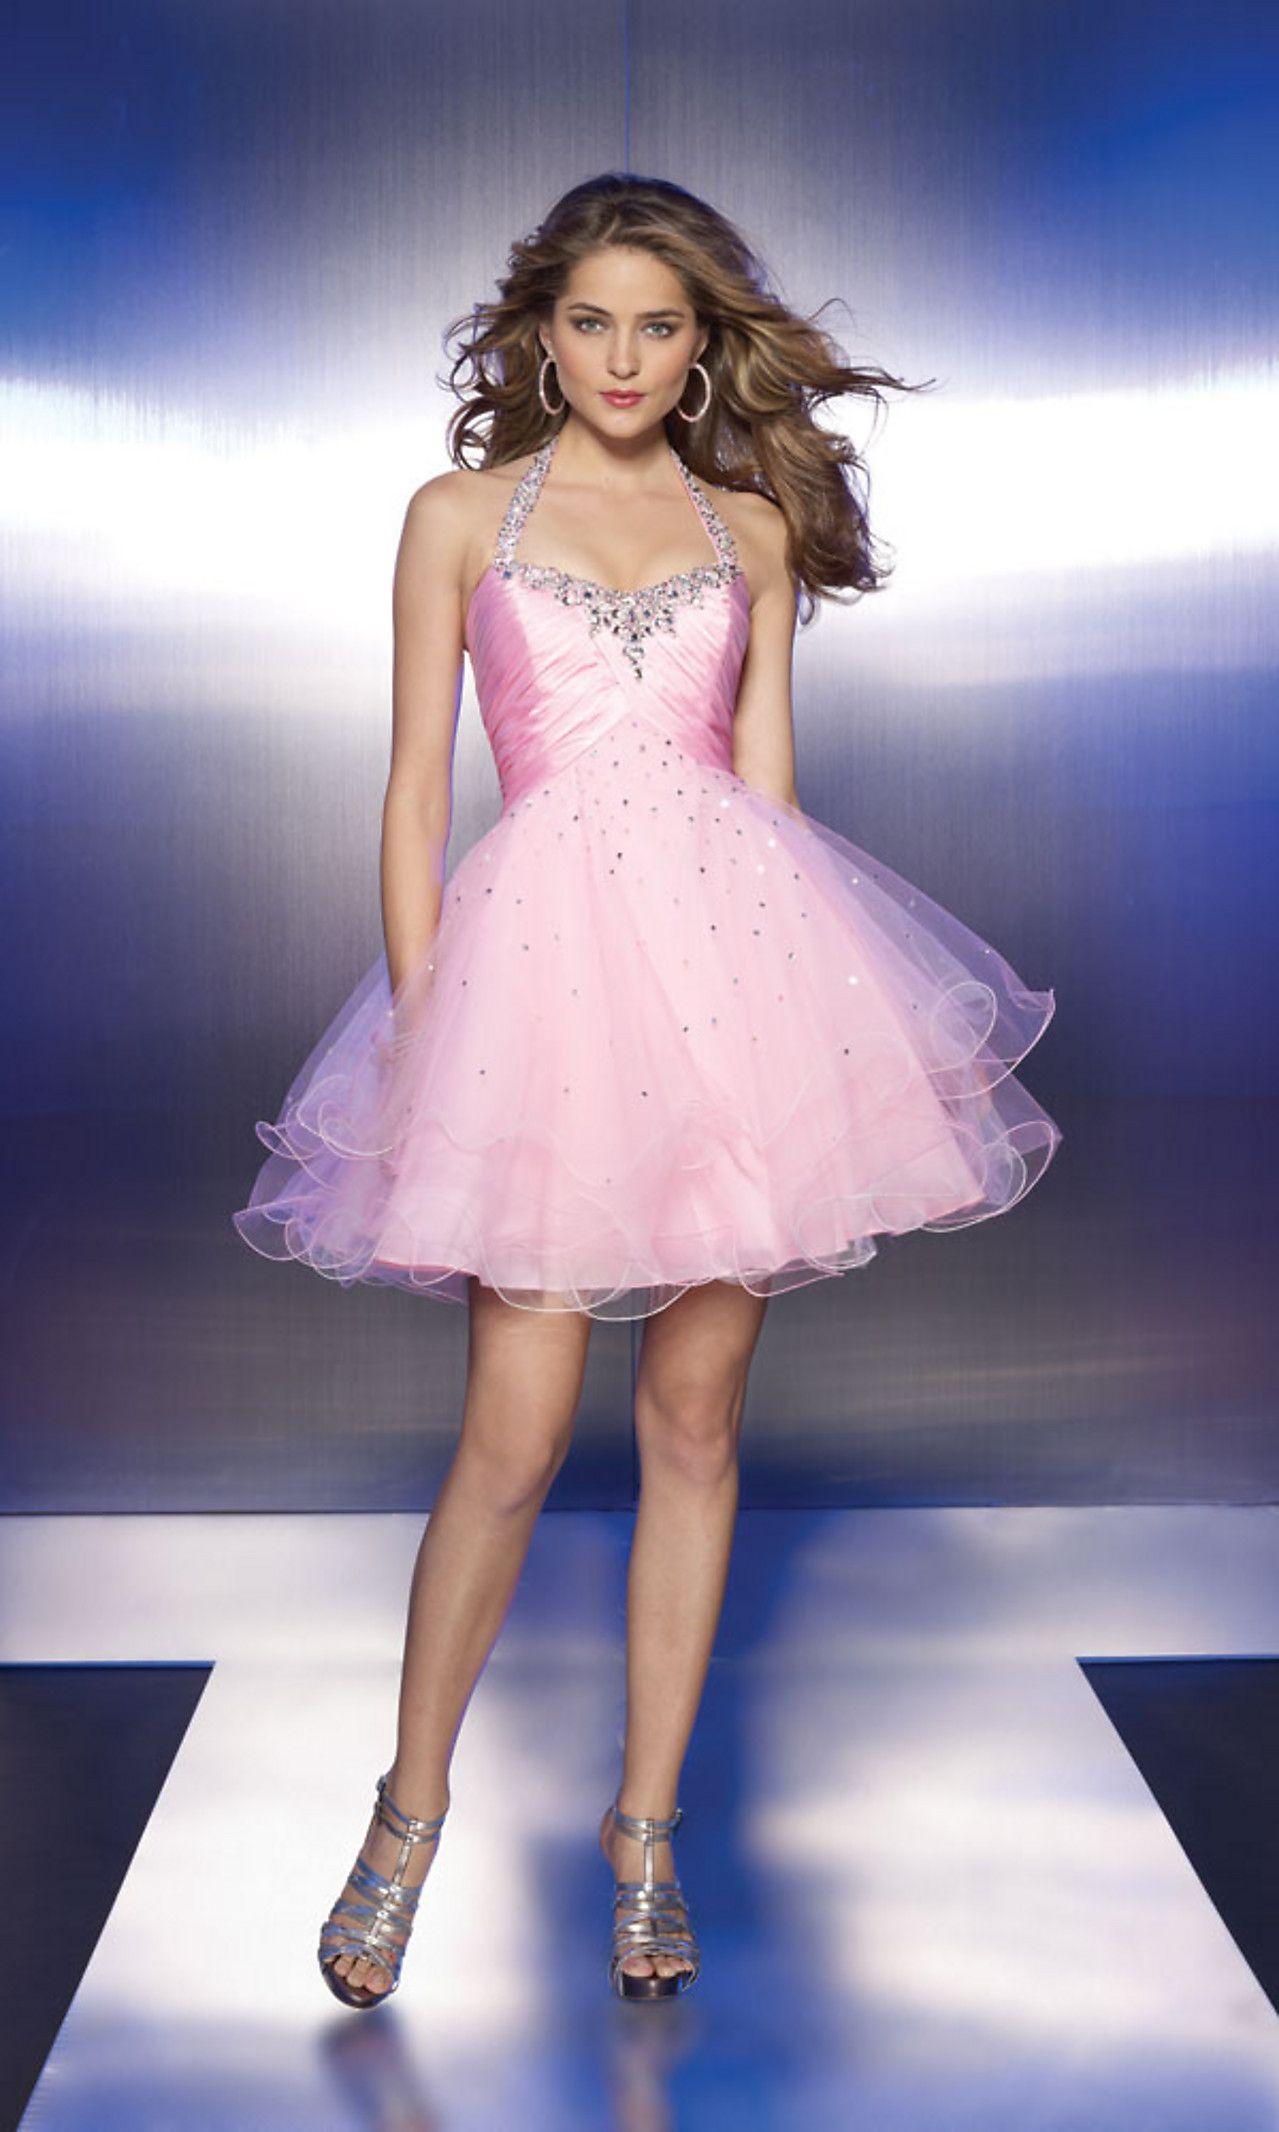 Halter top short dresses i want pinterest dresses prom